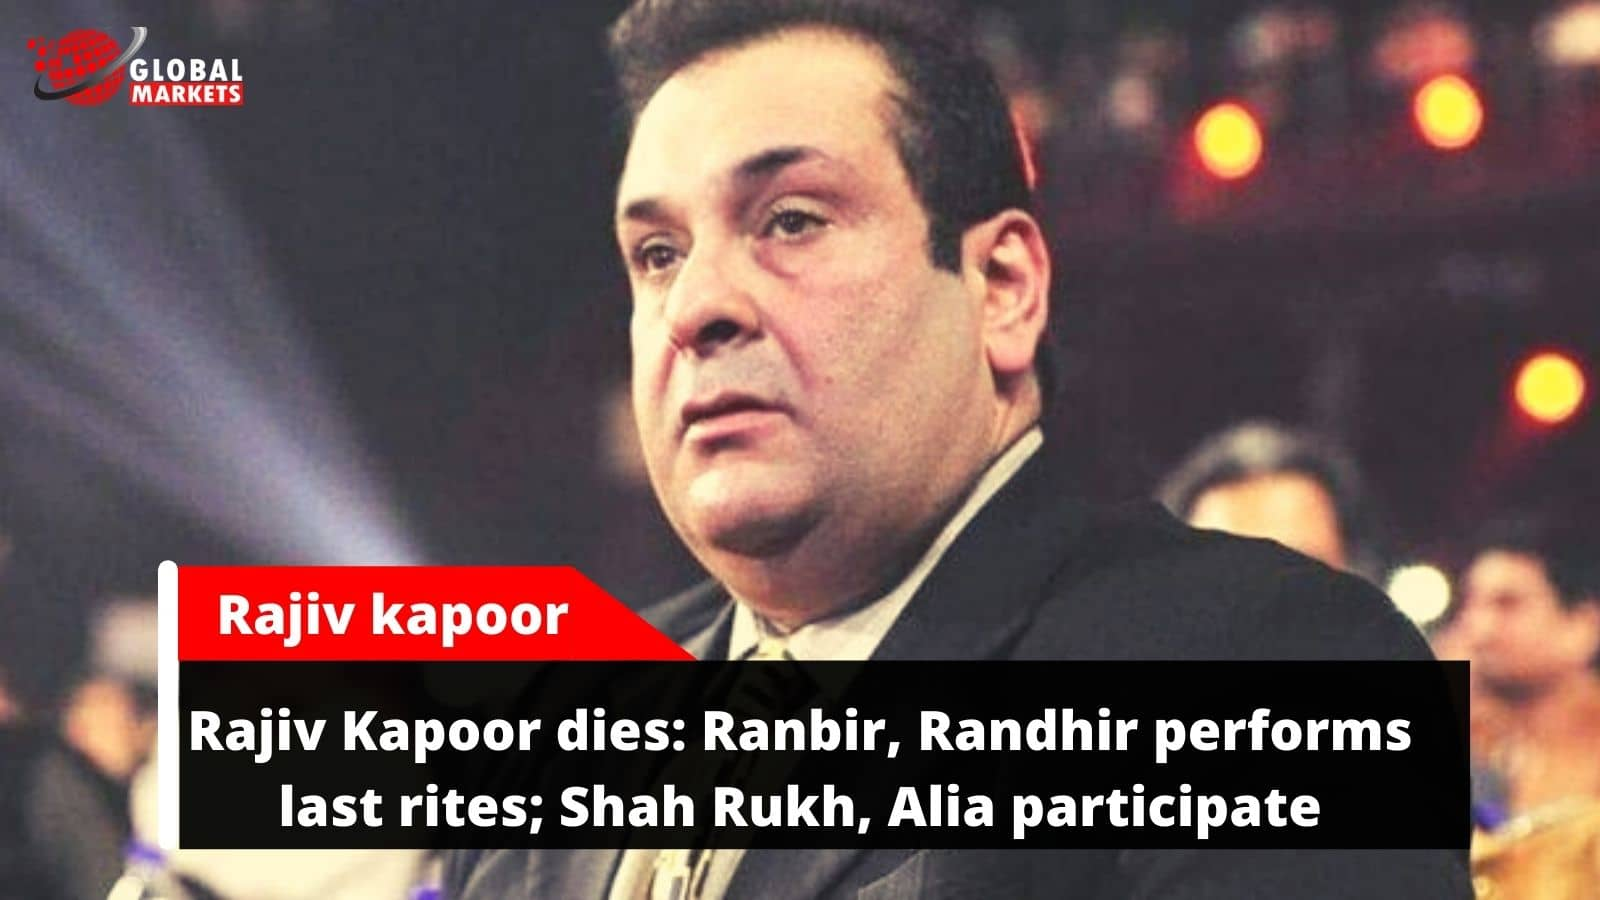 Rajiv Kapoor dies: Ranbir, Randhir performs last rites; Shah Rukh, Alia participate